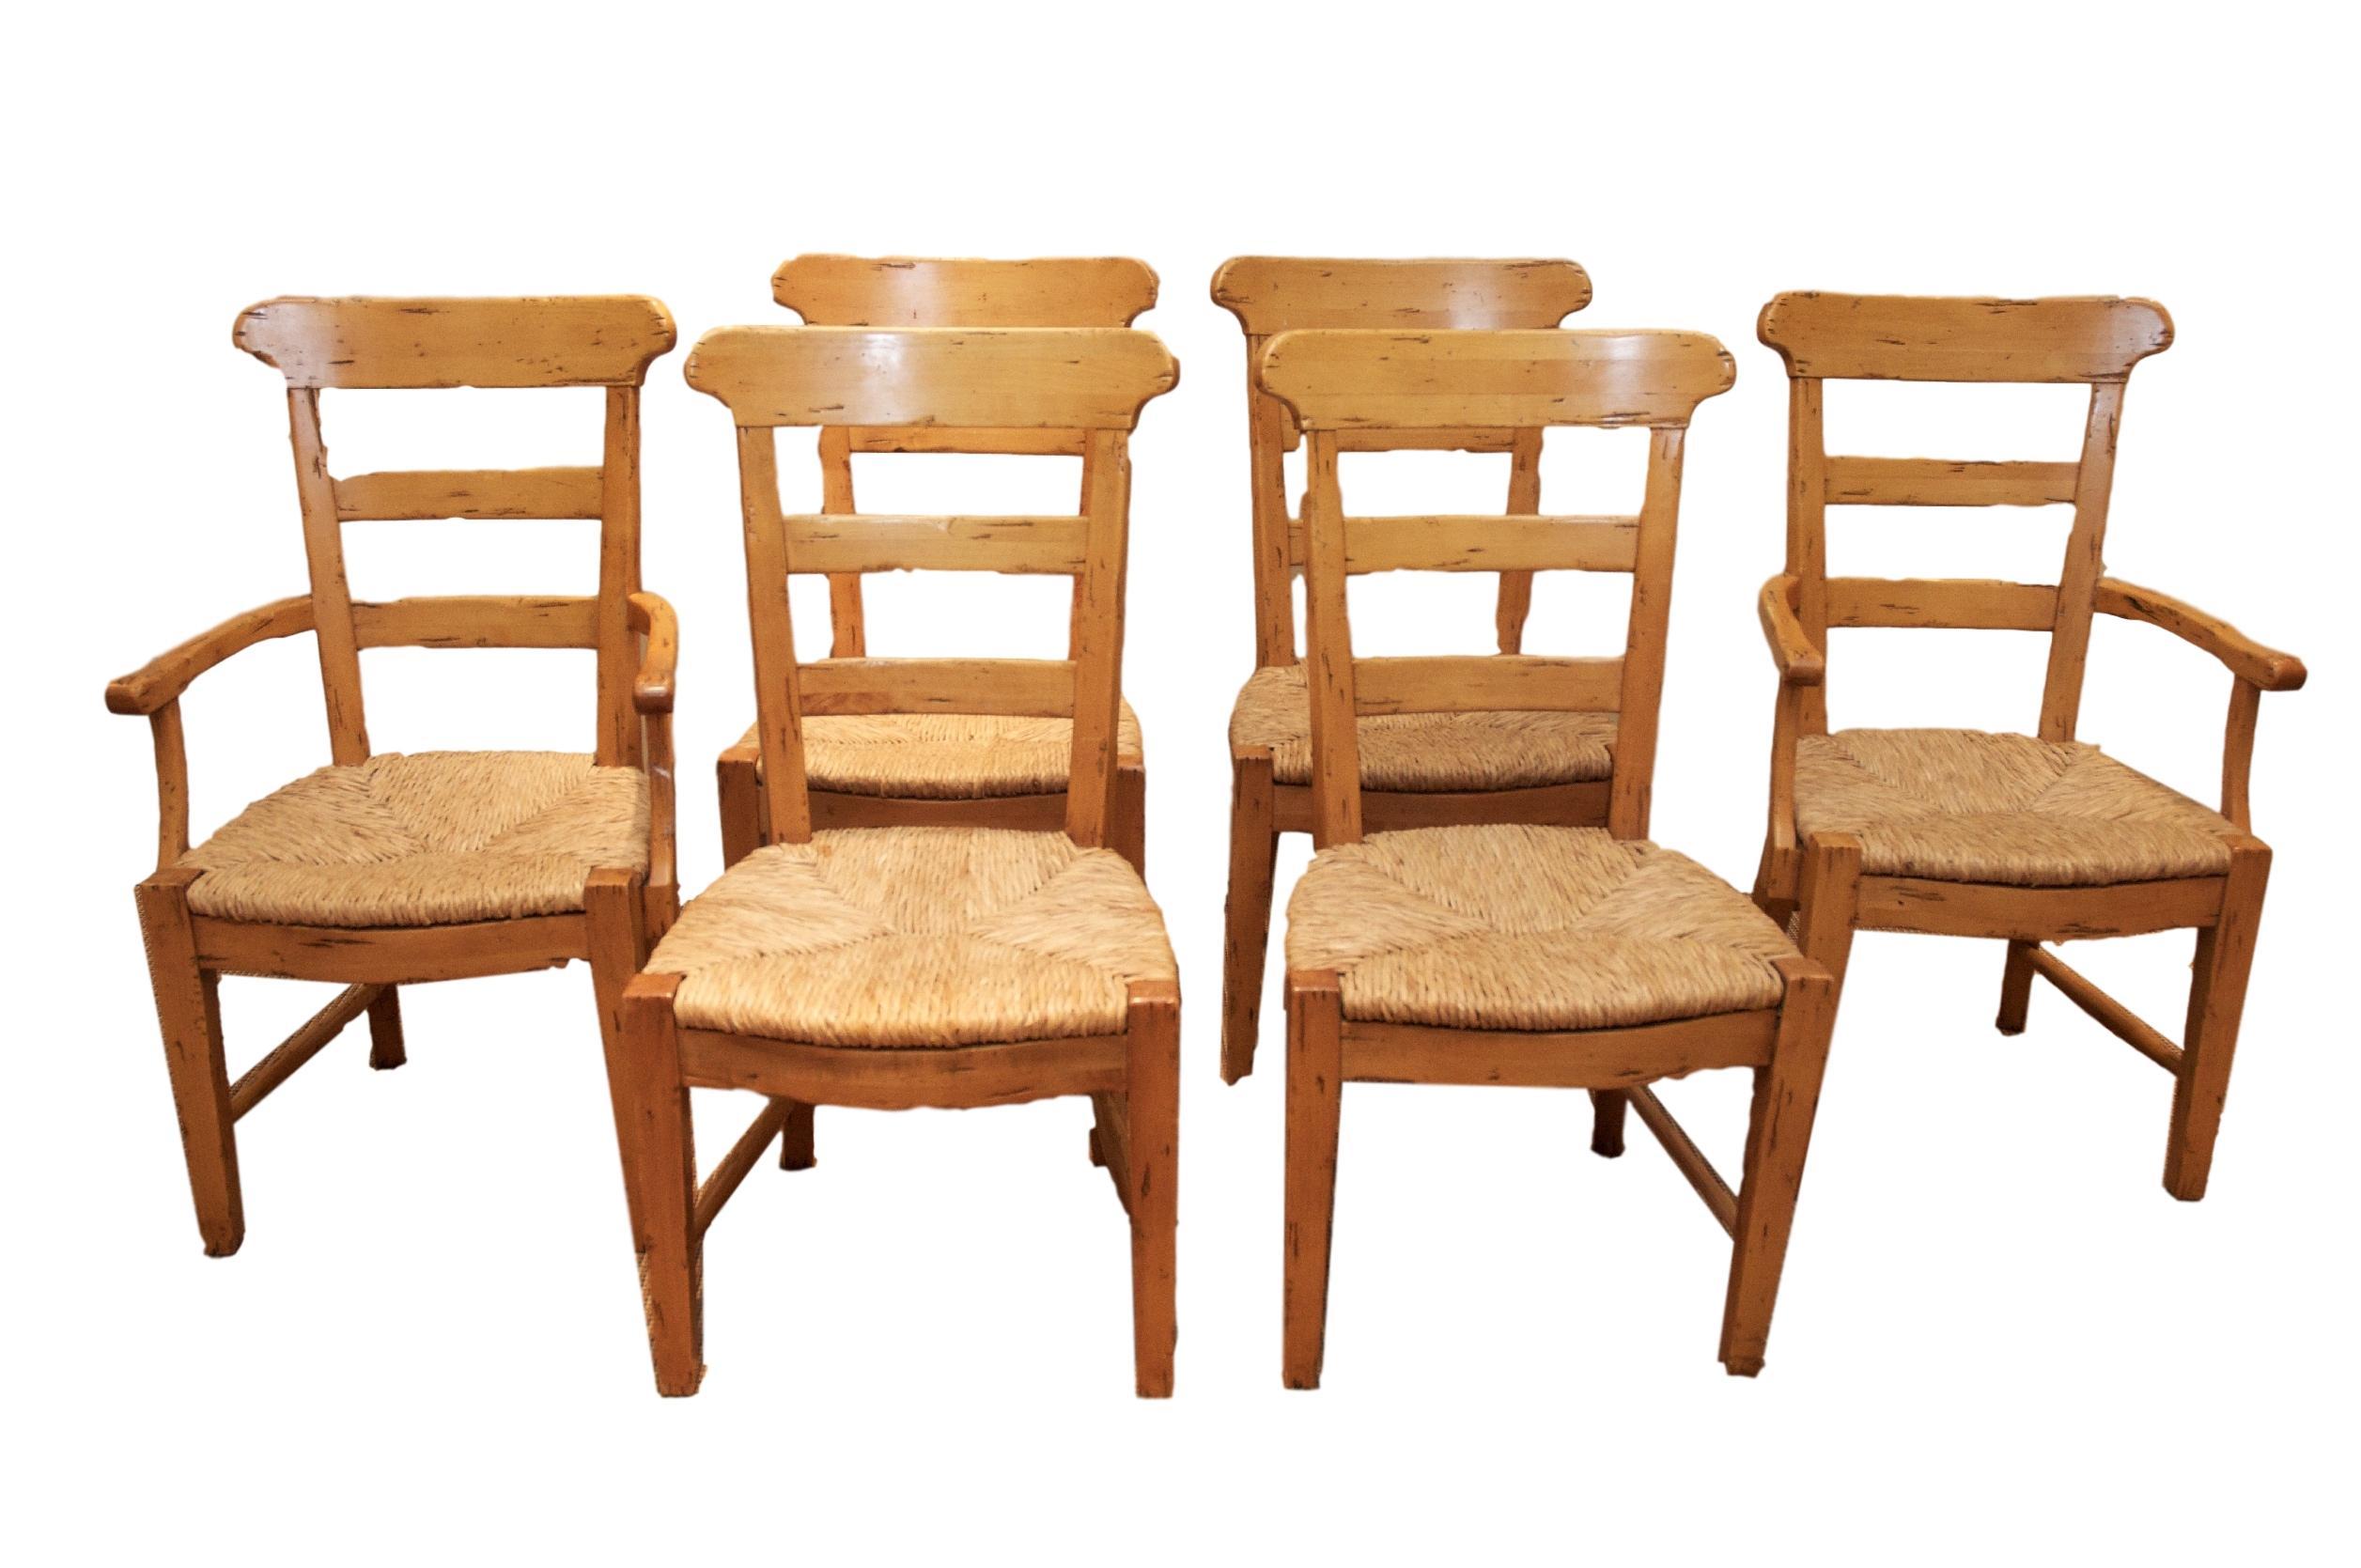 Fremarc Ladder Back Rush Seat Chairs   Set Of 6